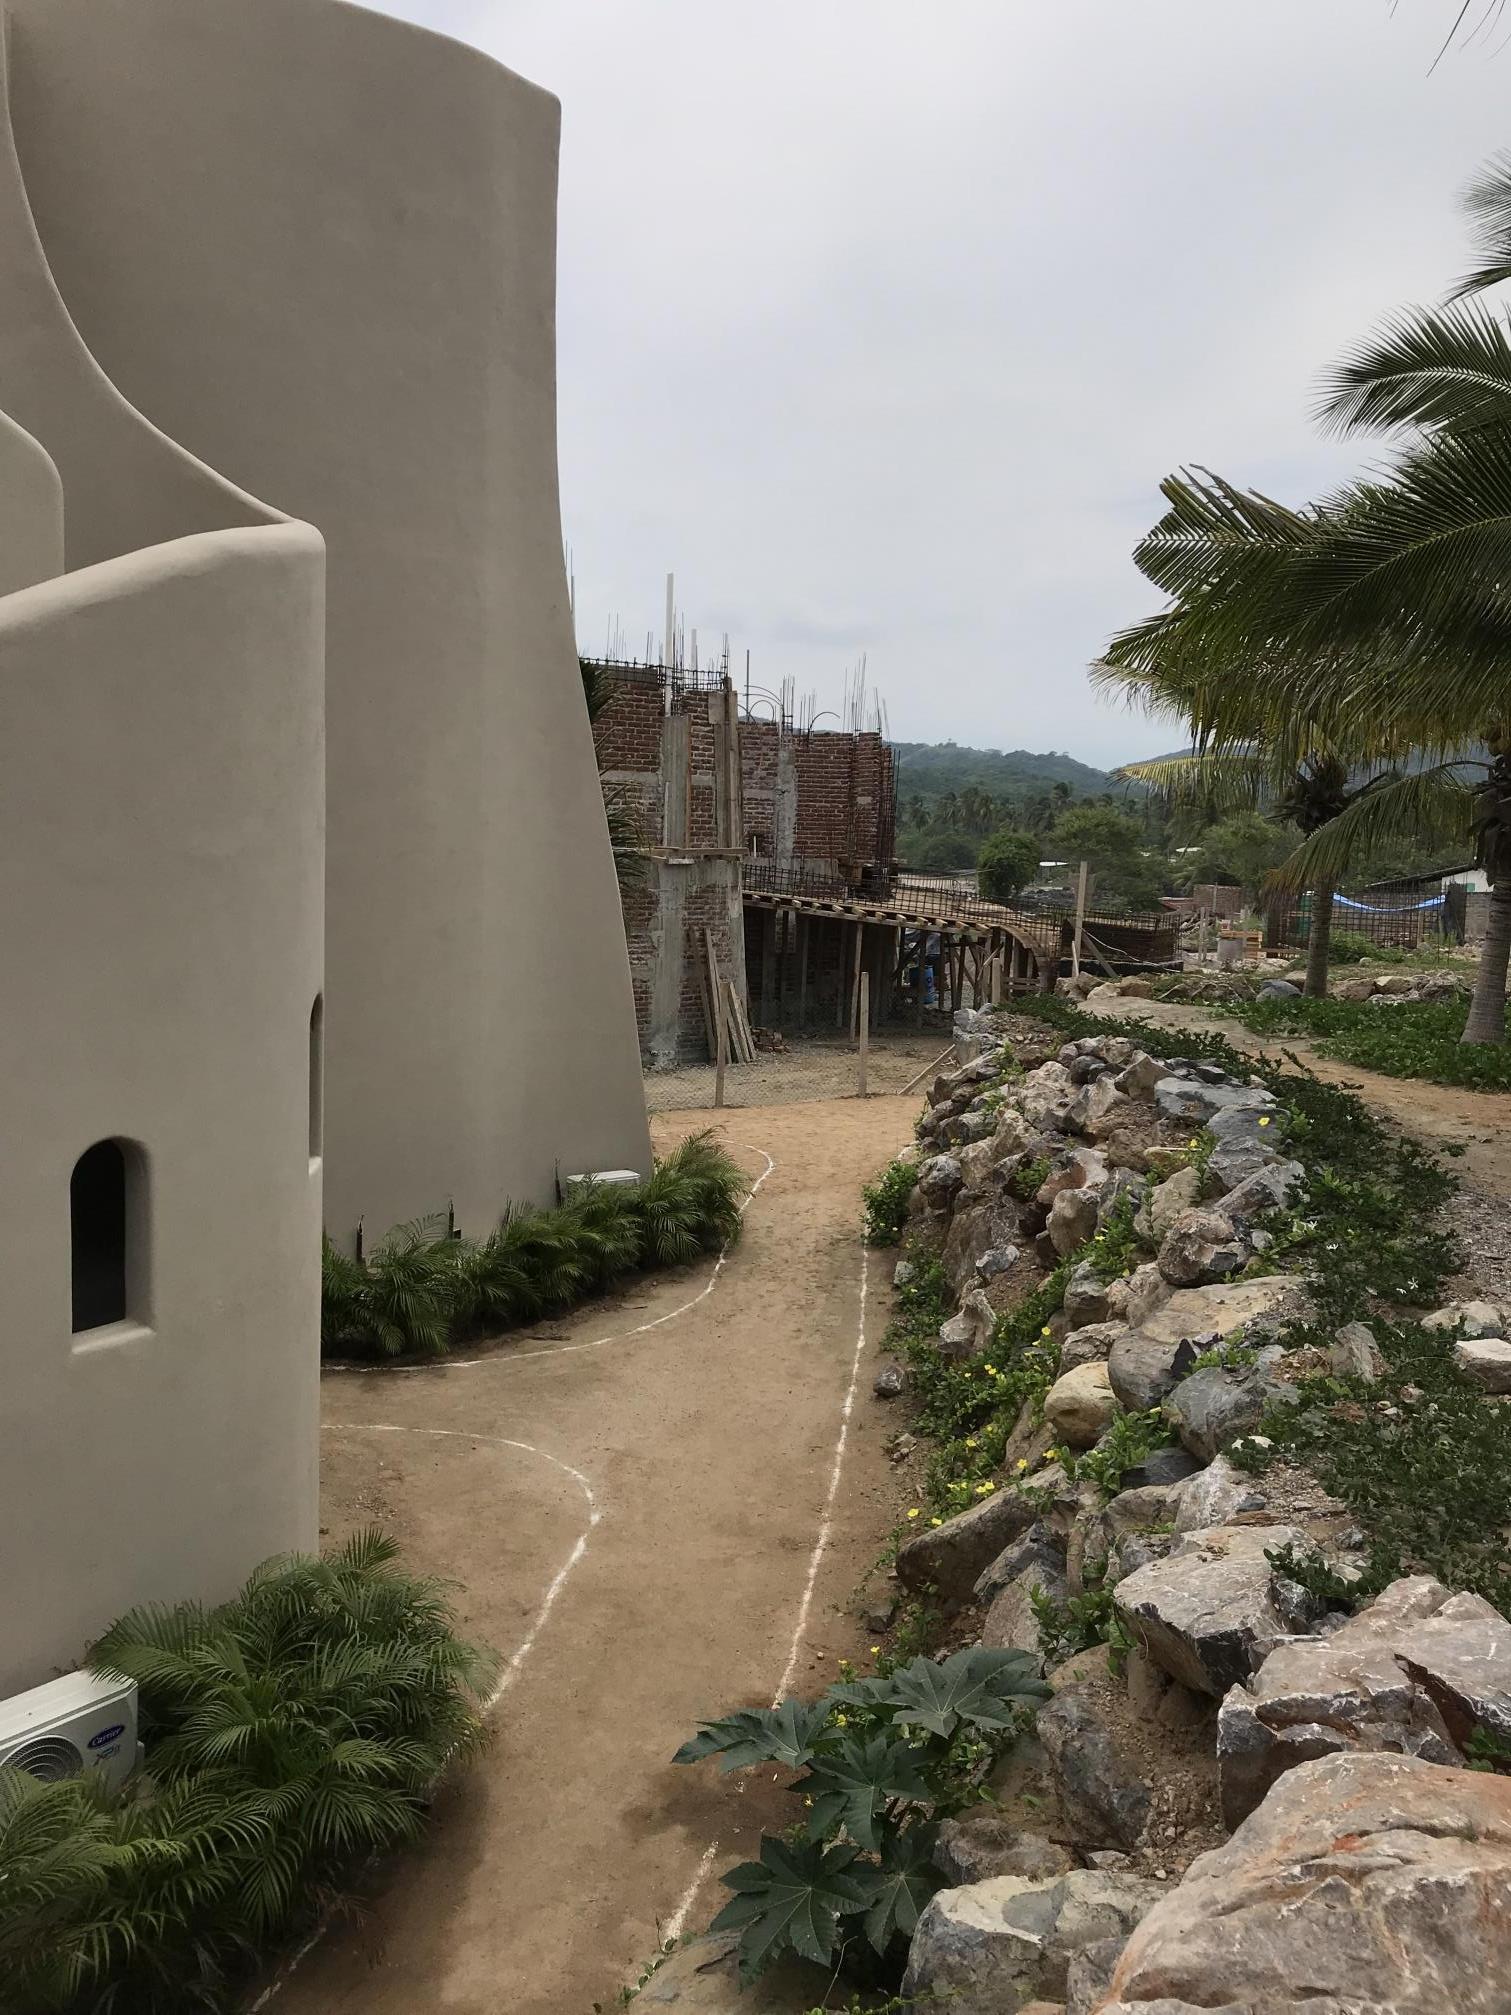 REPORTE-FOTOGRAFICO-PUNTA-MAJAHUA-18-DE-AGOSTO-DEL-2018-049.jpg